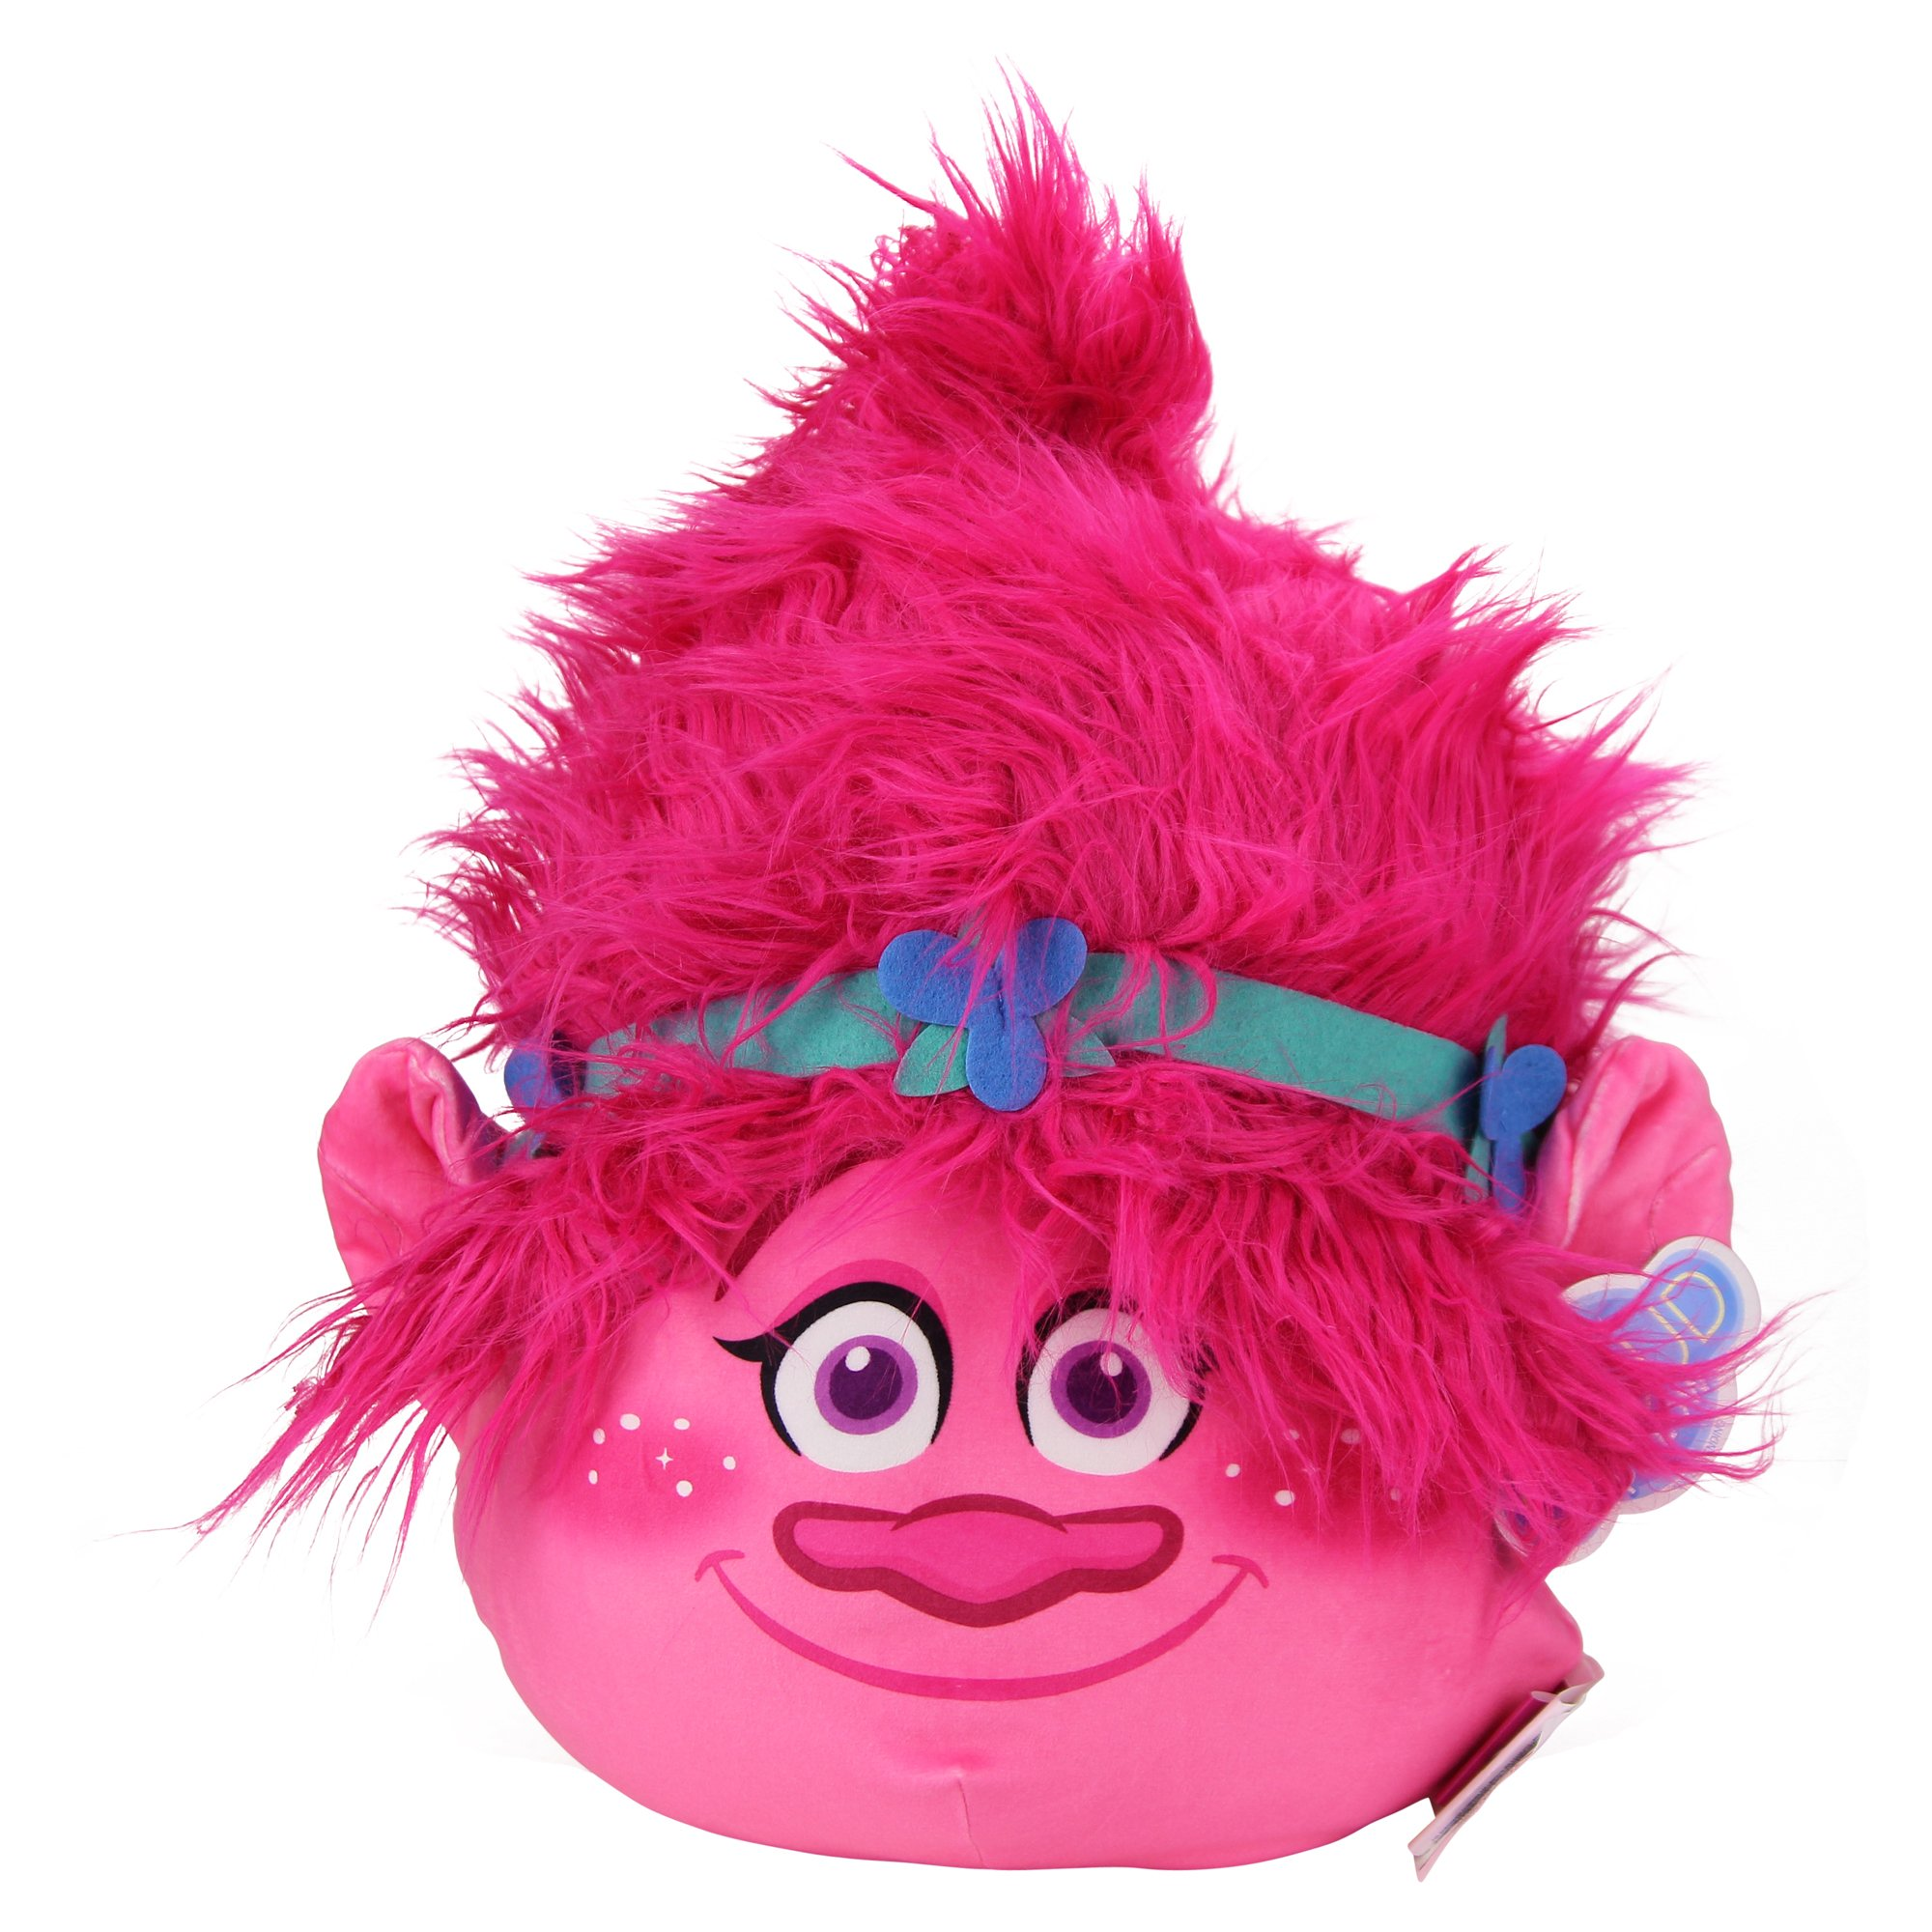 Northwest Kid's Character Travel Plush Pillow (Trolls (Poppy Pink)) by Northwest